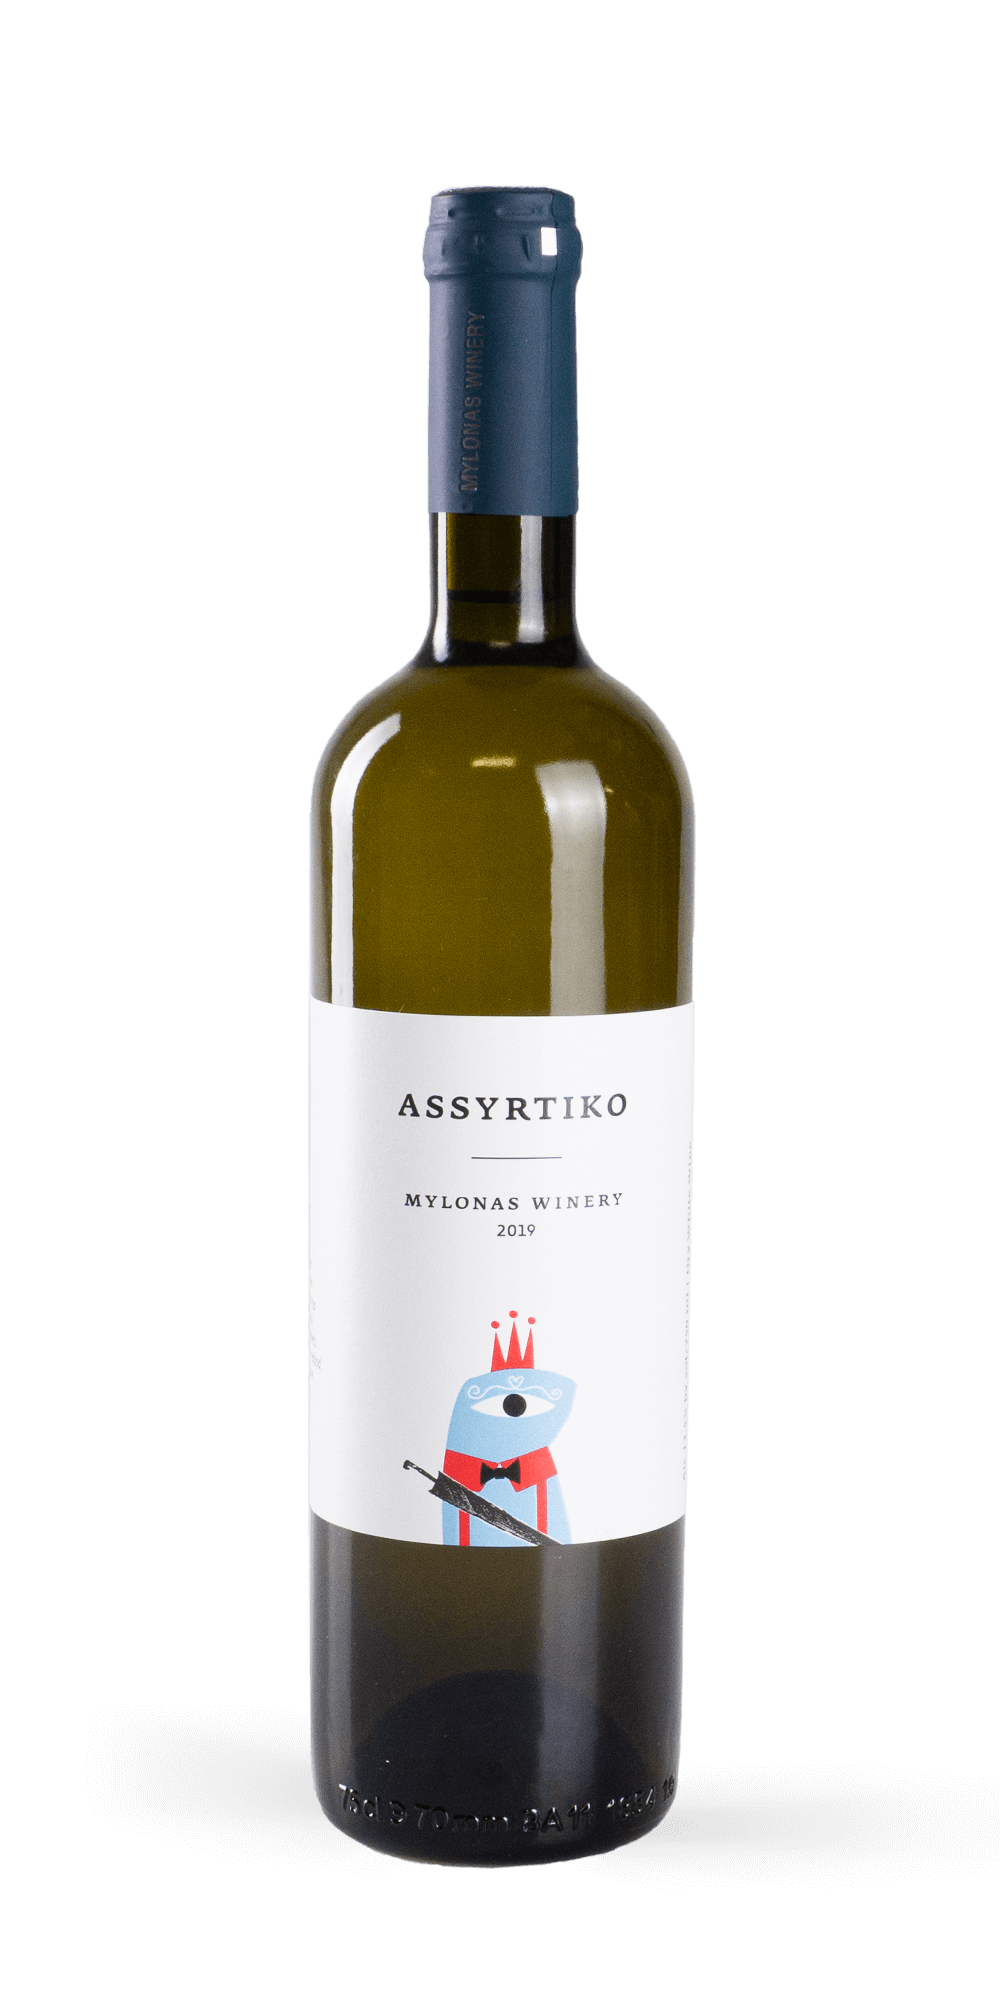 Assyrtiko 2020 - Mylonas Winery